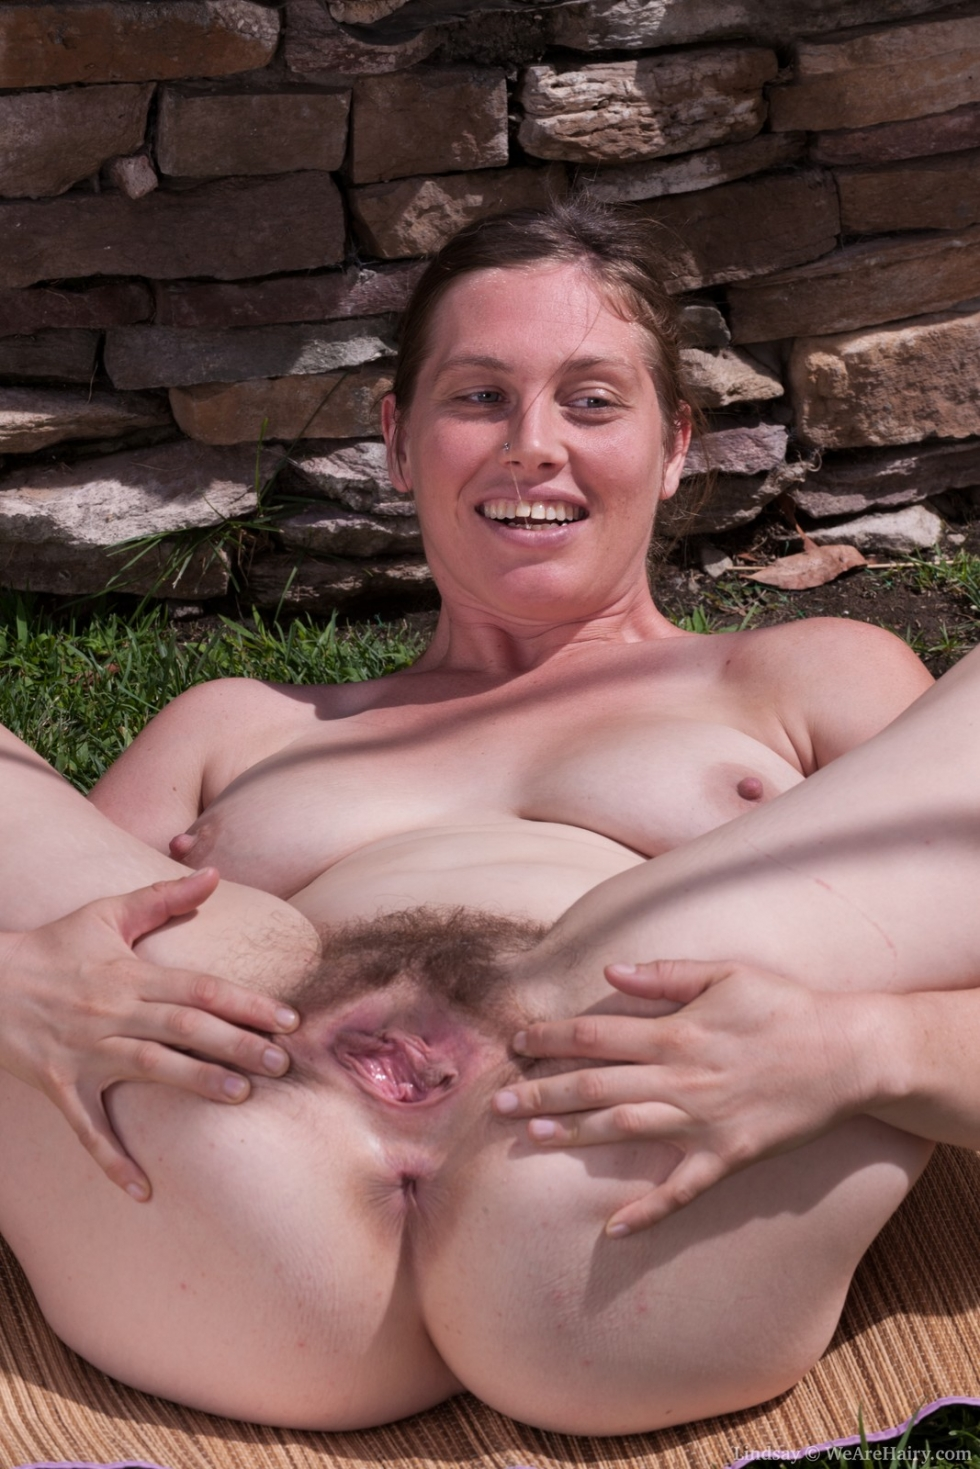 hairy sex outdoor video